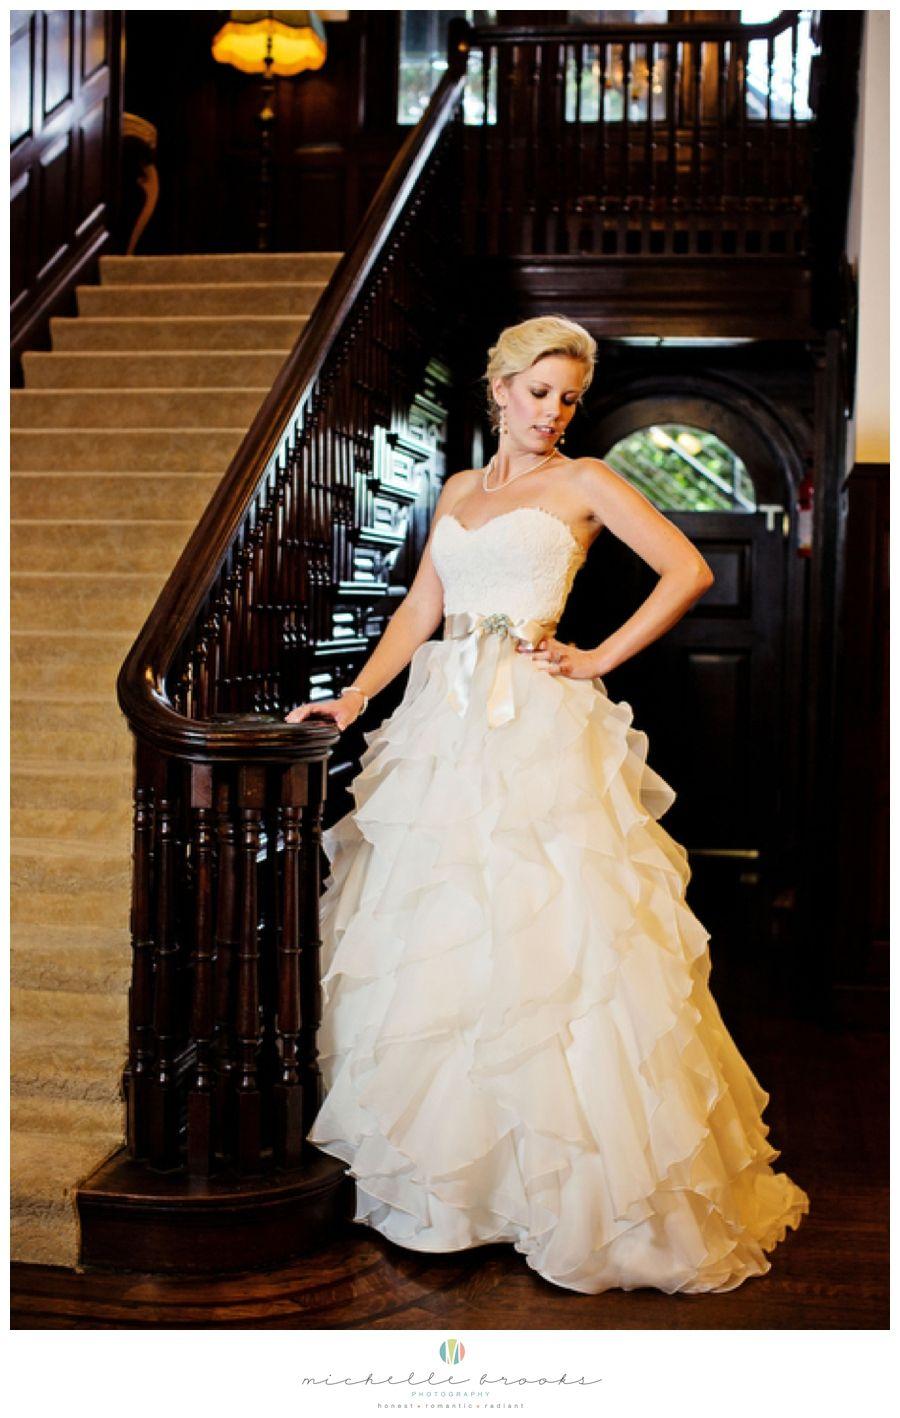 Betsy\'s Bridal at Gassaway Mansion in Greenville, SC 16 | Bridals ...